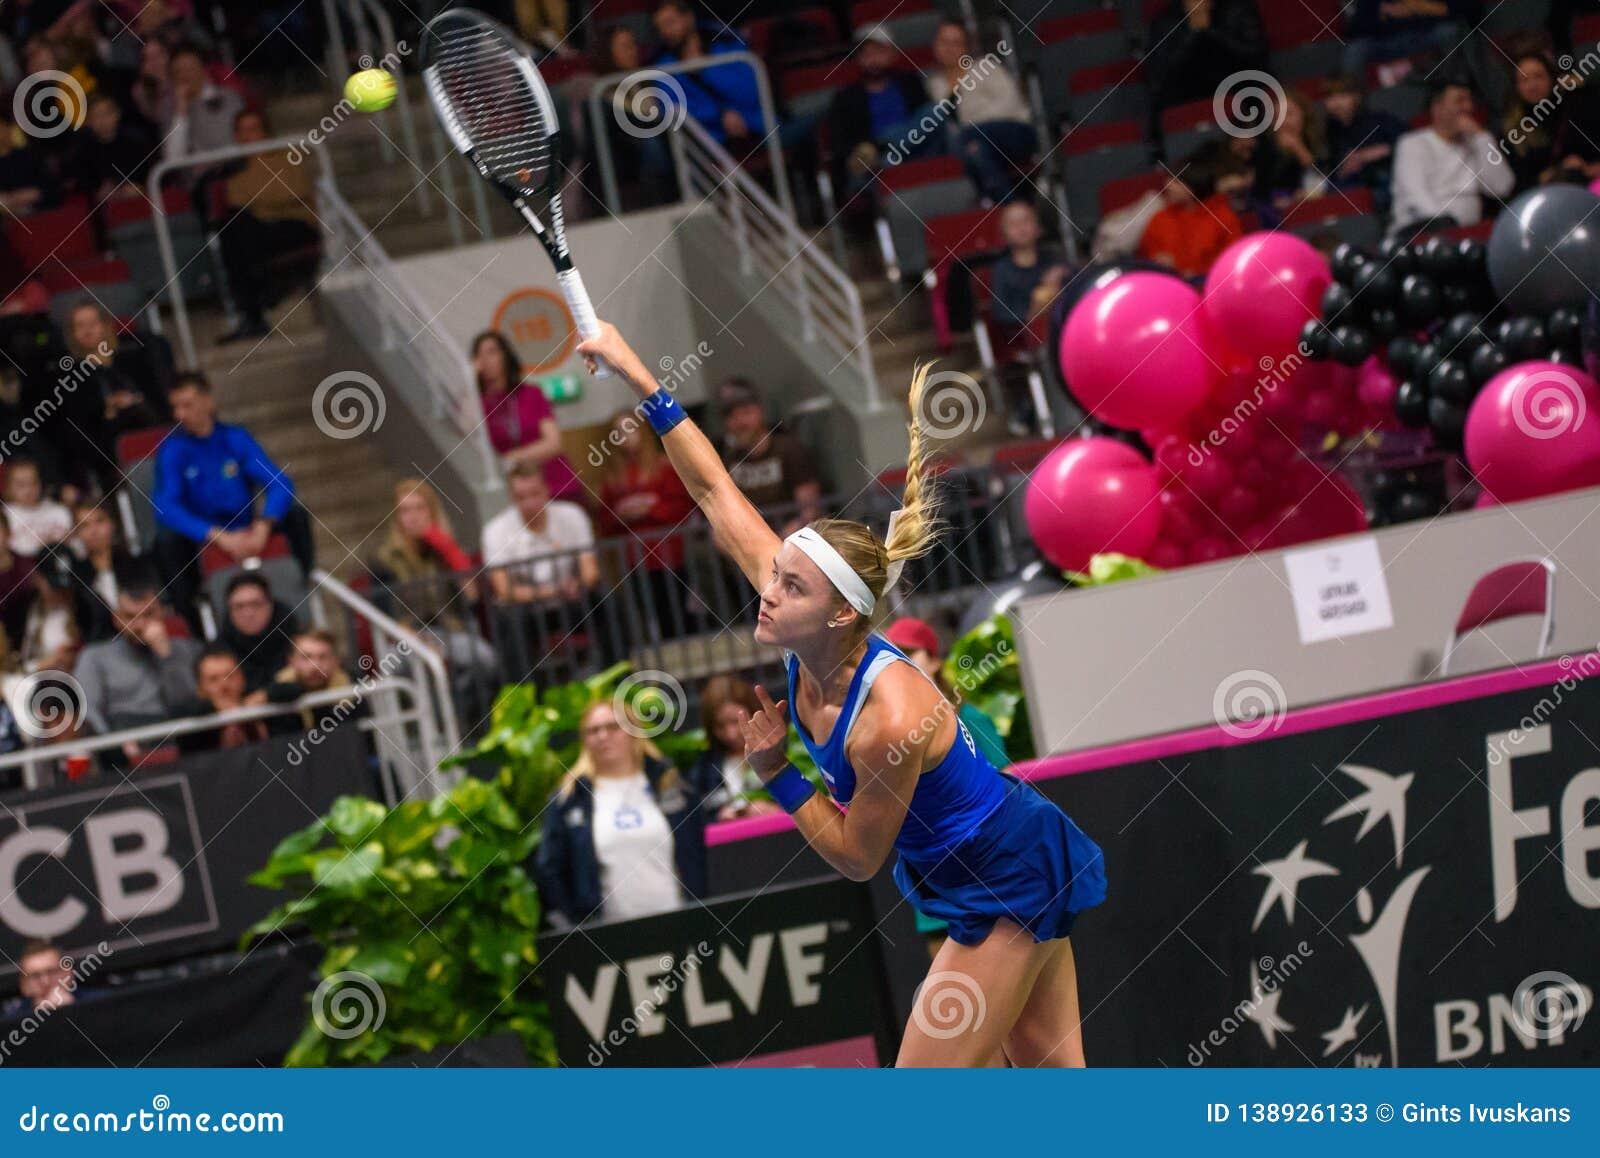 Anna Karolina Schmiedlova, during World Group II First Round game between team Latvia and team Slovakia